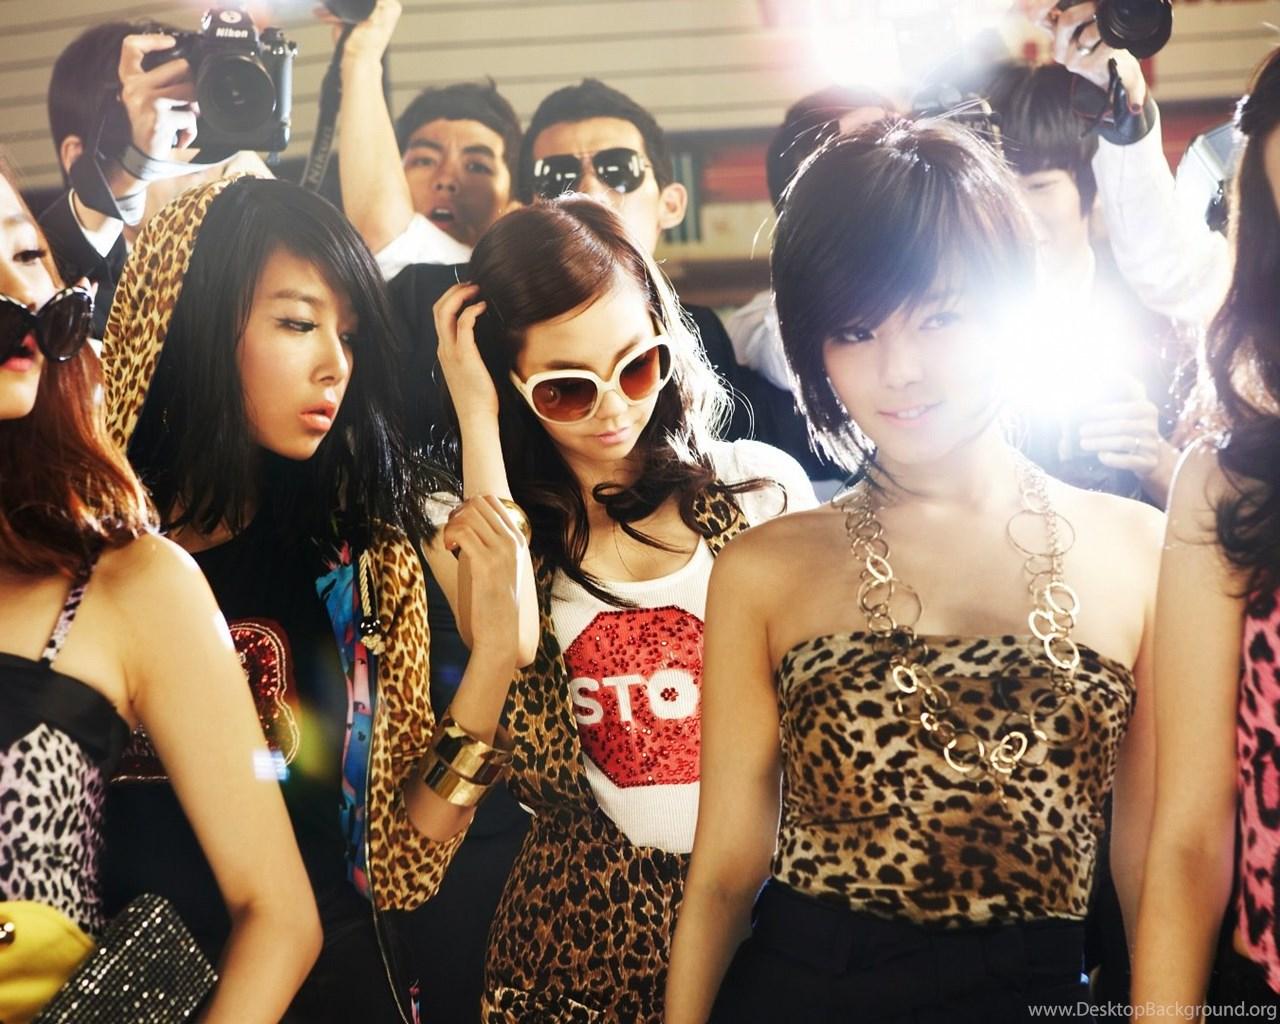 Wonder girls so hot translation — 15